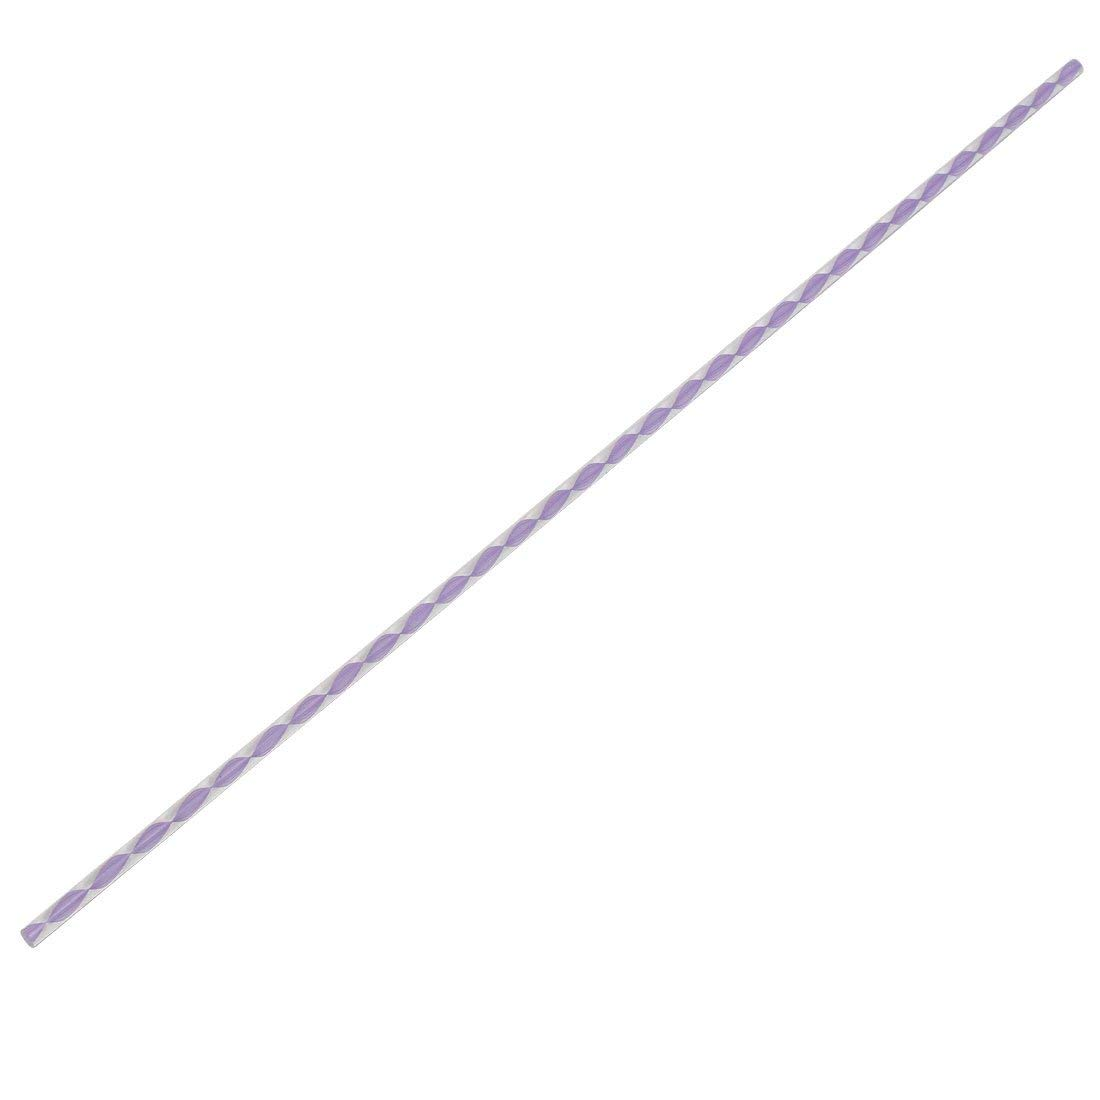 Twisted Light Purple Line Solid Acrylic Round Rod PMMA Bar 500mmx6mm